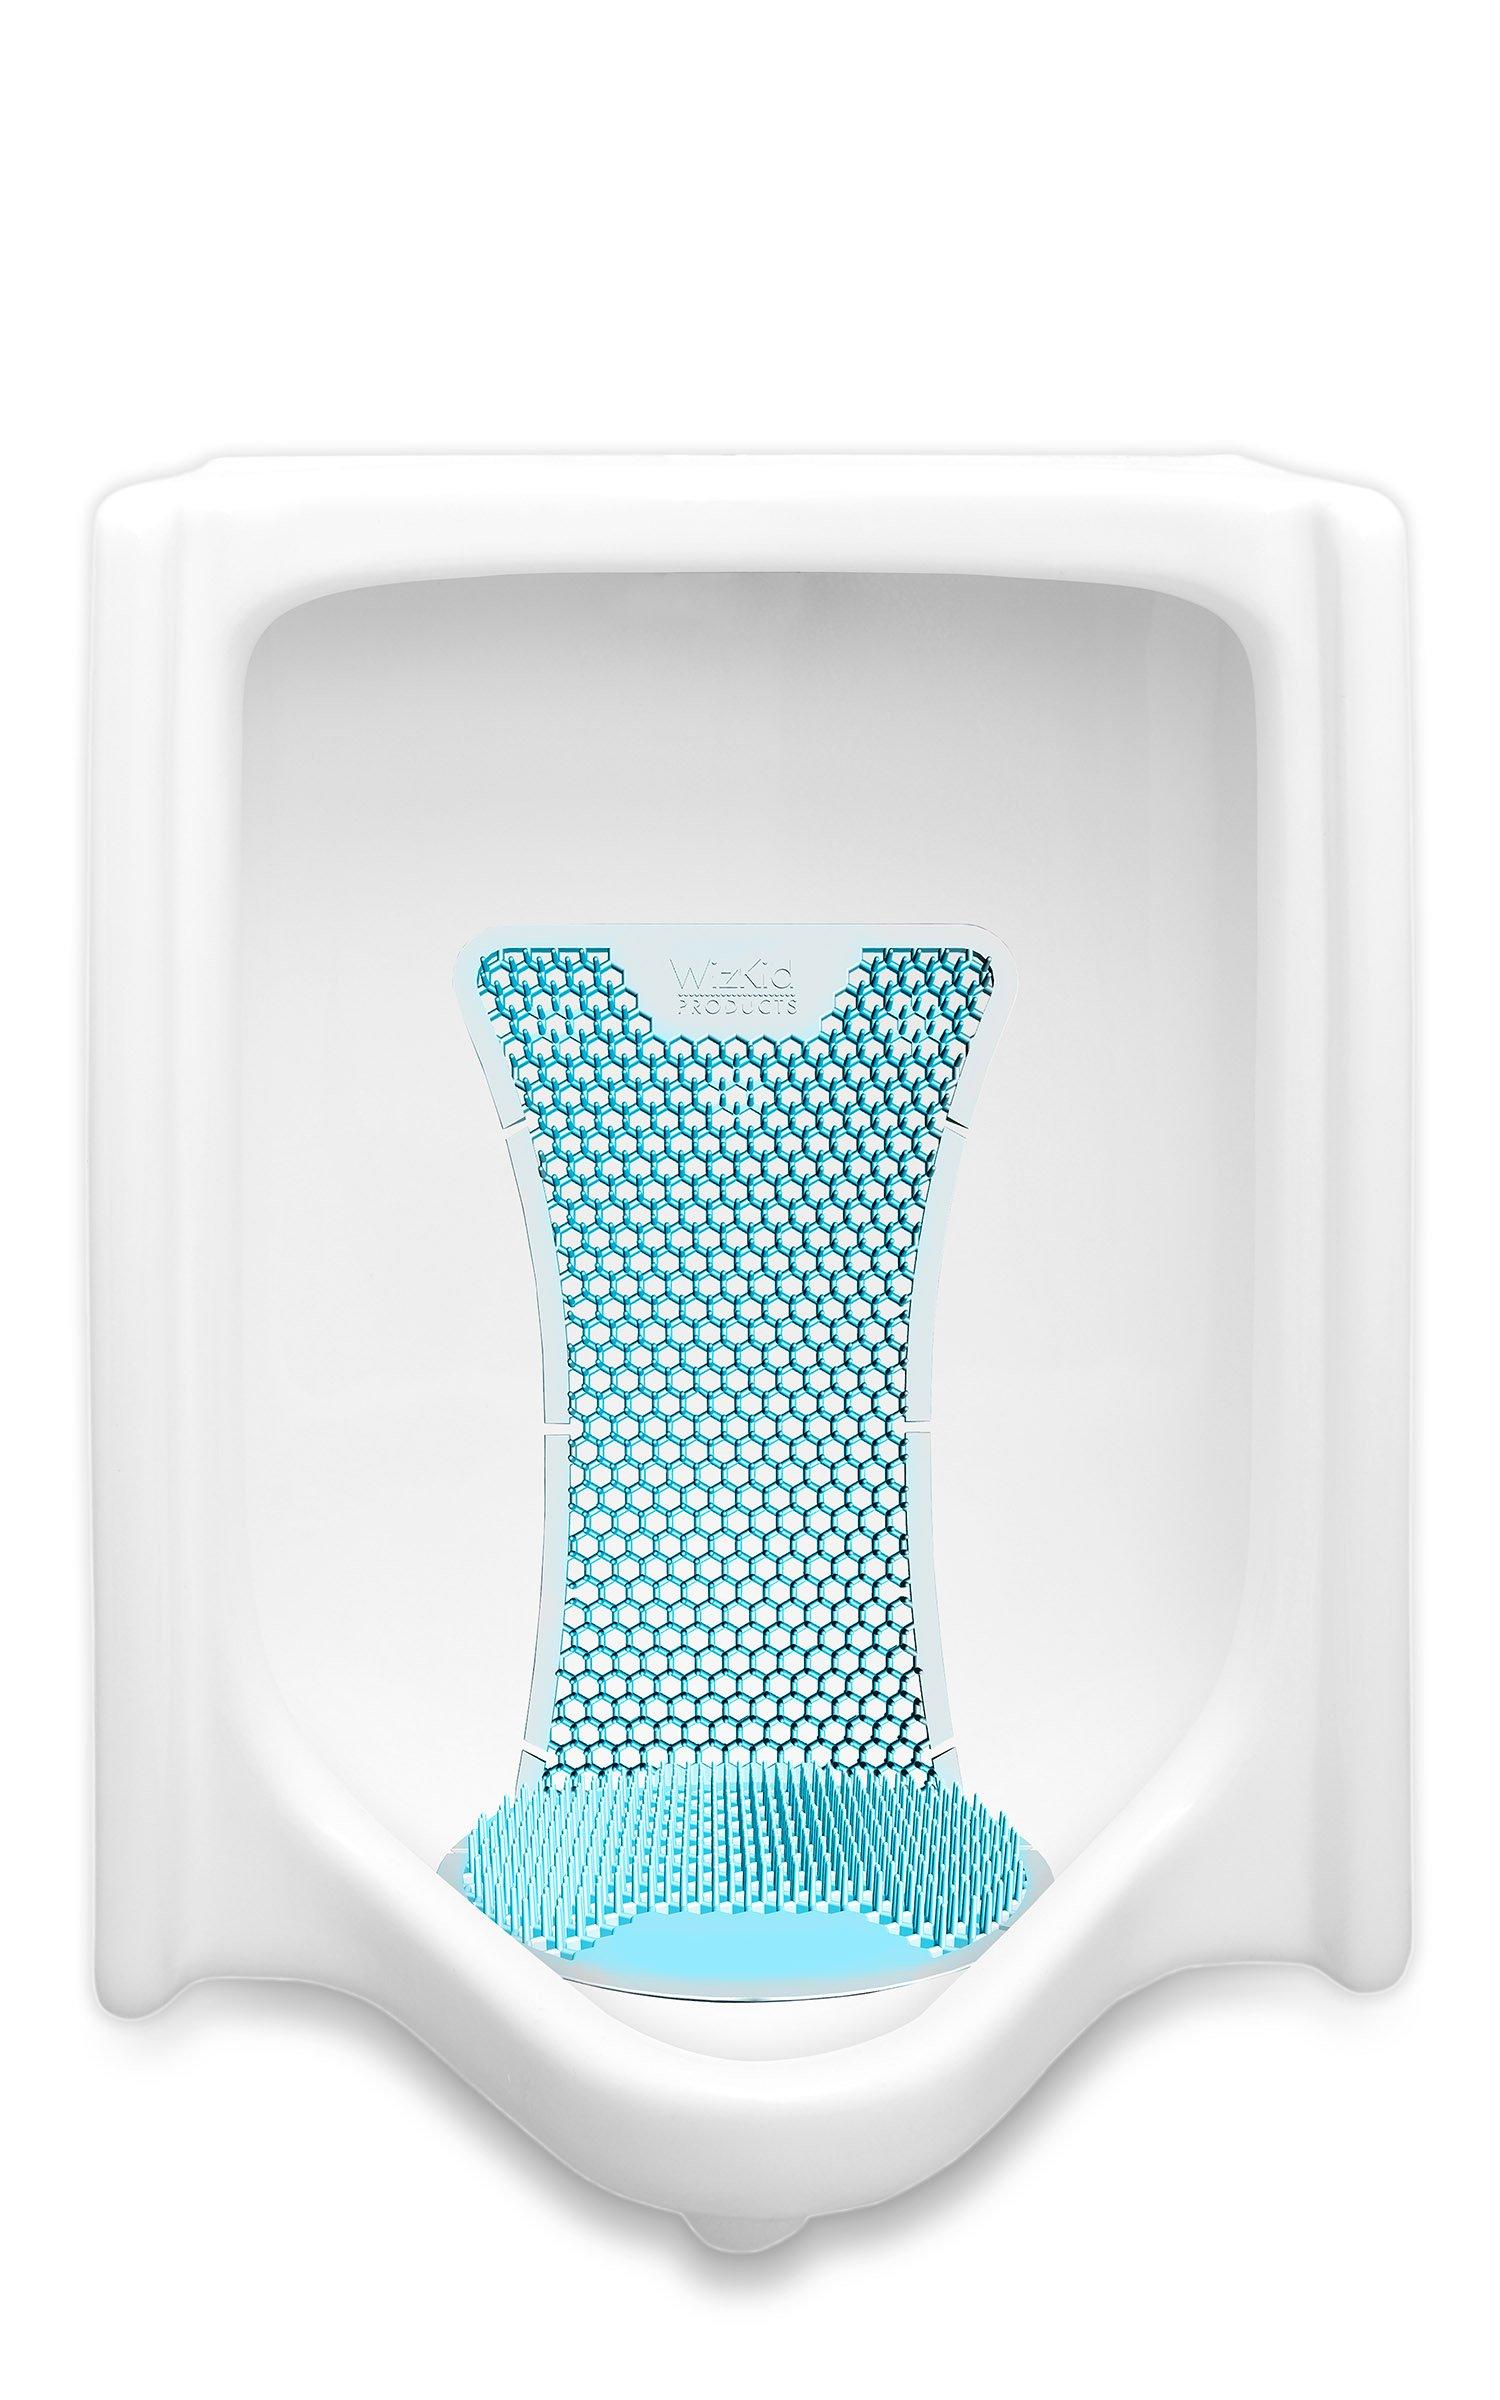 T Market Splash Hog Urinal Screen - Clean Scent   Reduces Splash-Back   Long Lasting Fragrance   Deodorizes for up to 60 Days   6-Pack, Light Blue by T Market (Image #2)